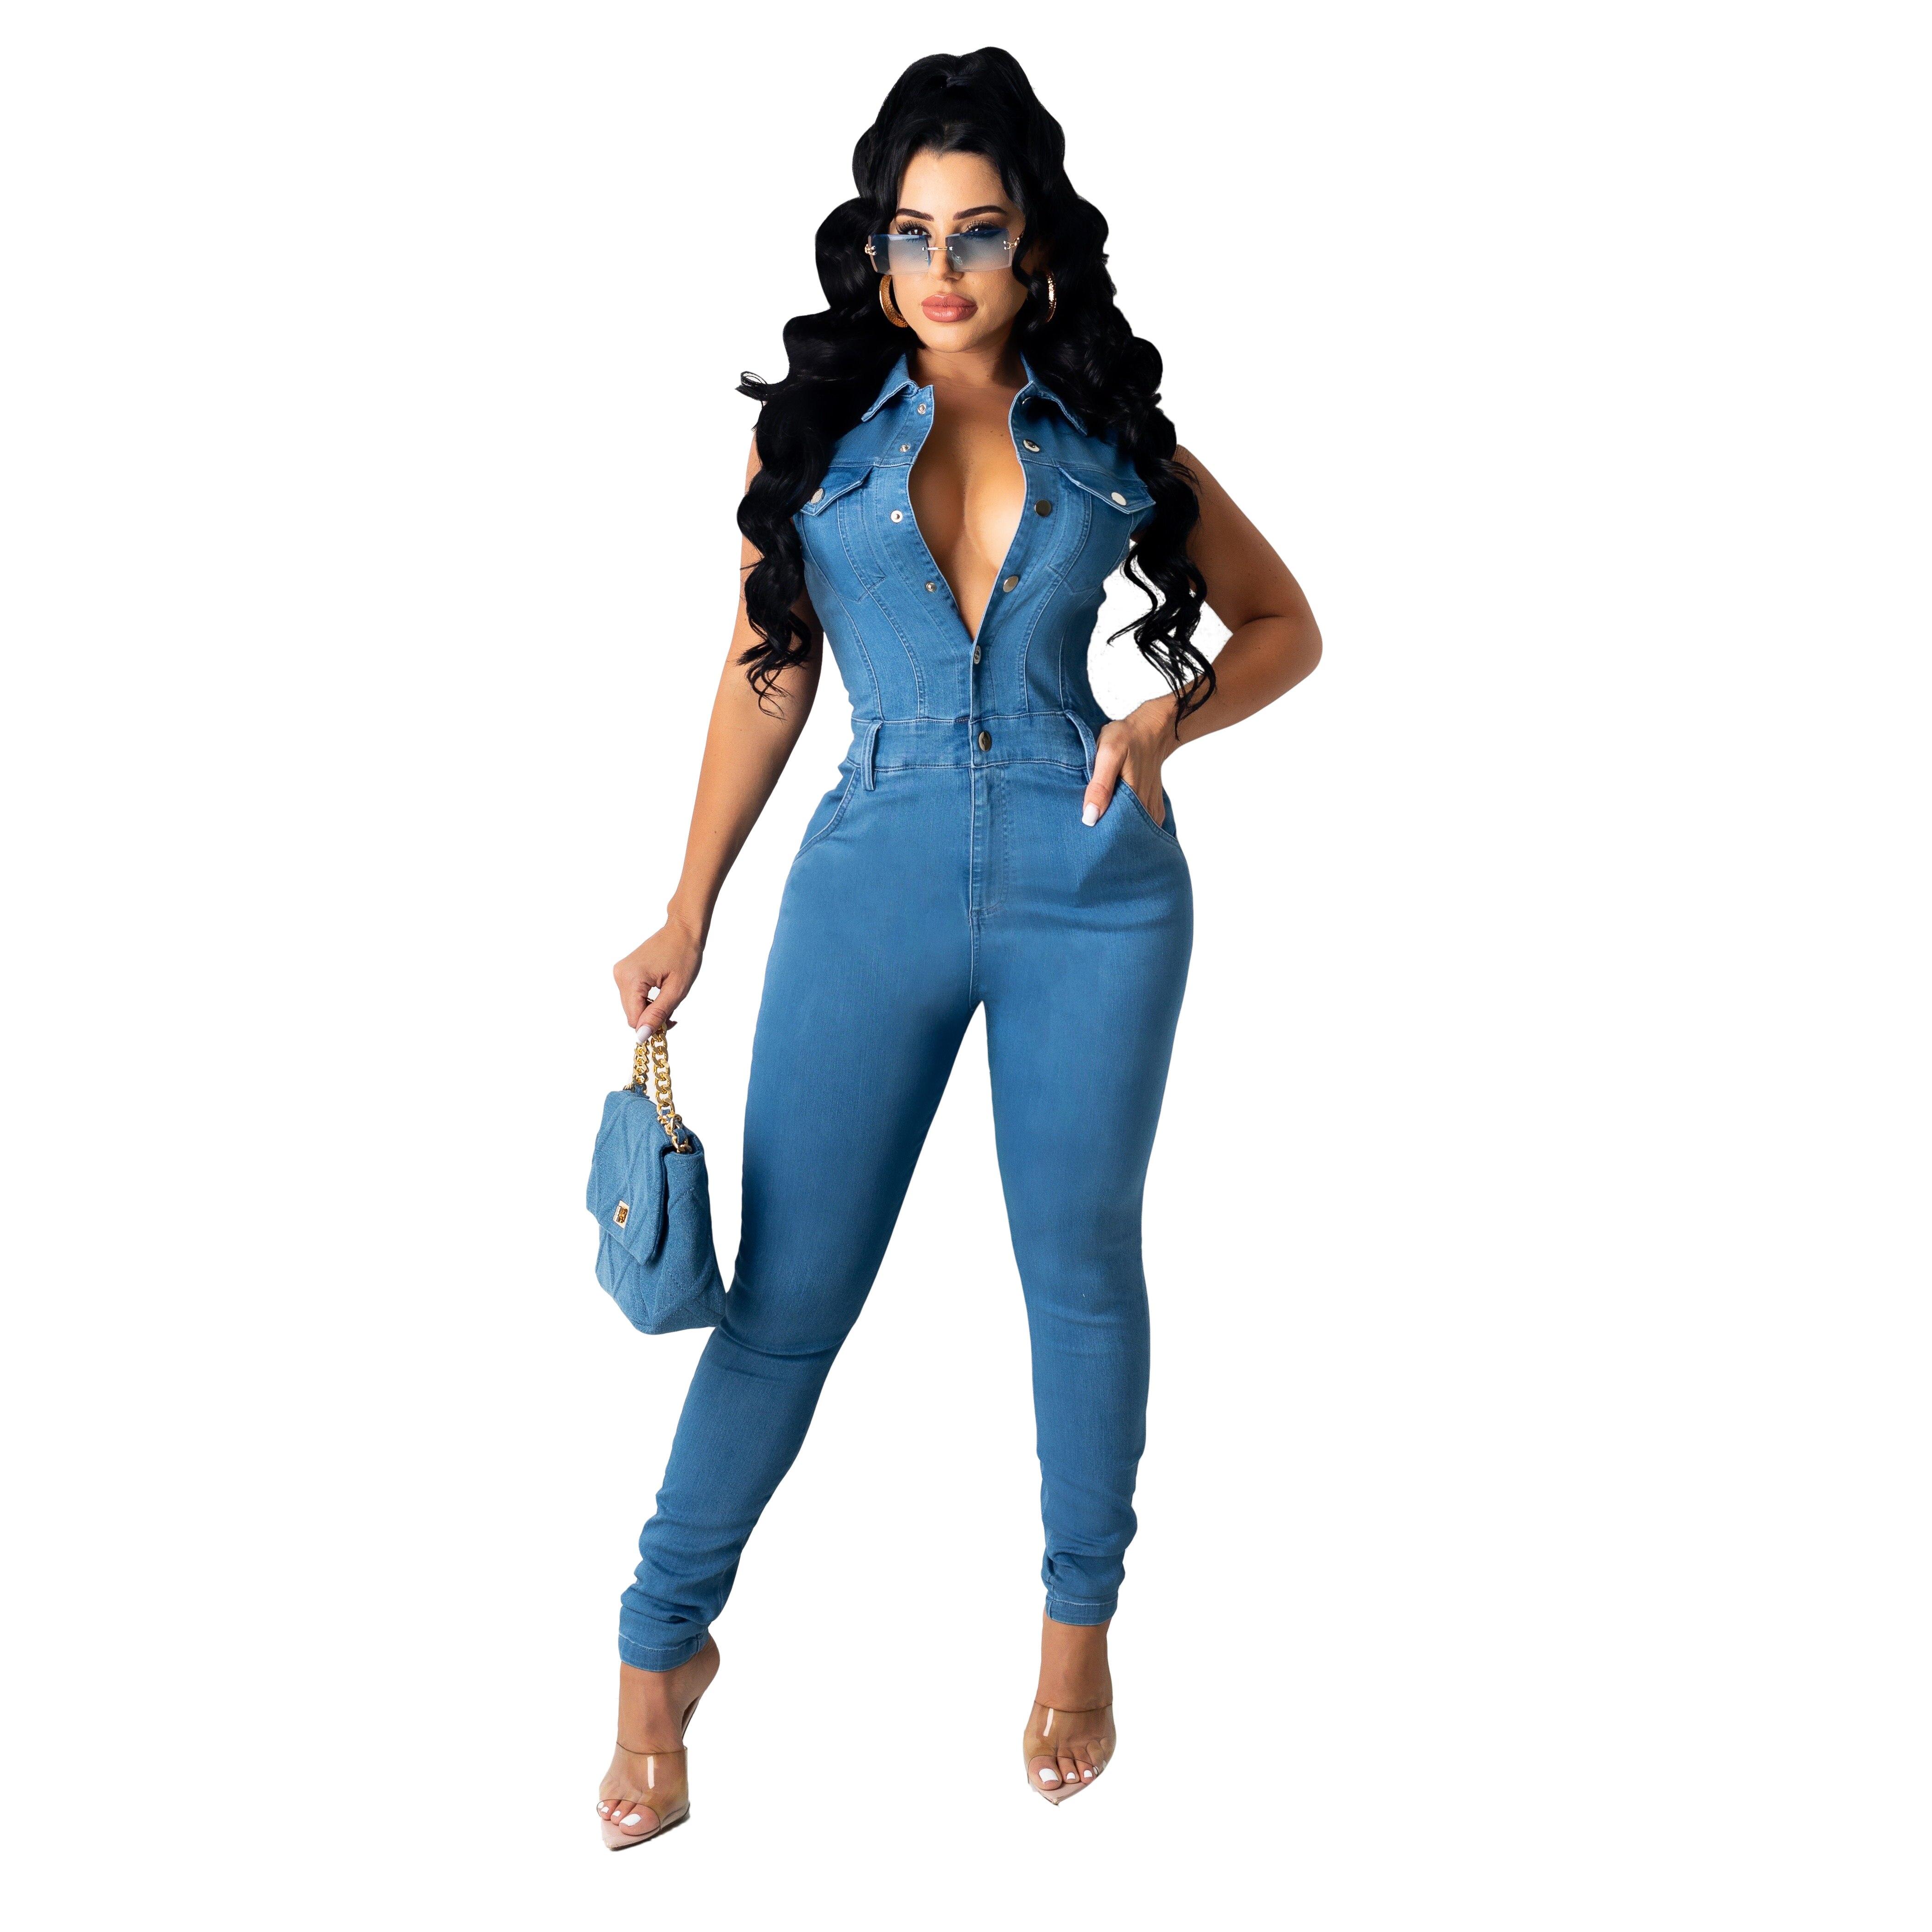 Fashion new denim slim slimming sleeveless jumpsuit jeans grunge jeans ,women pants high rise jeans women pants enlarge